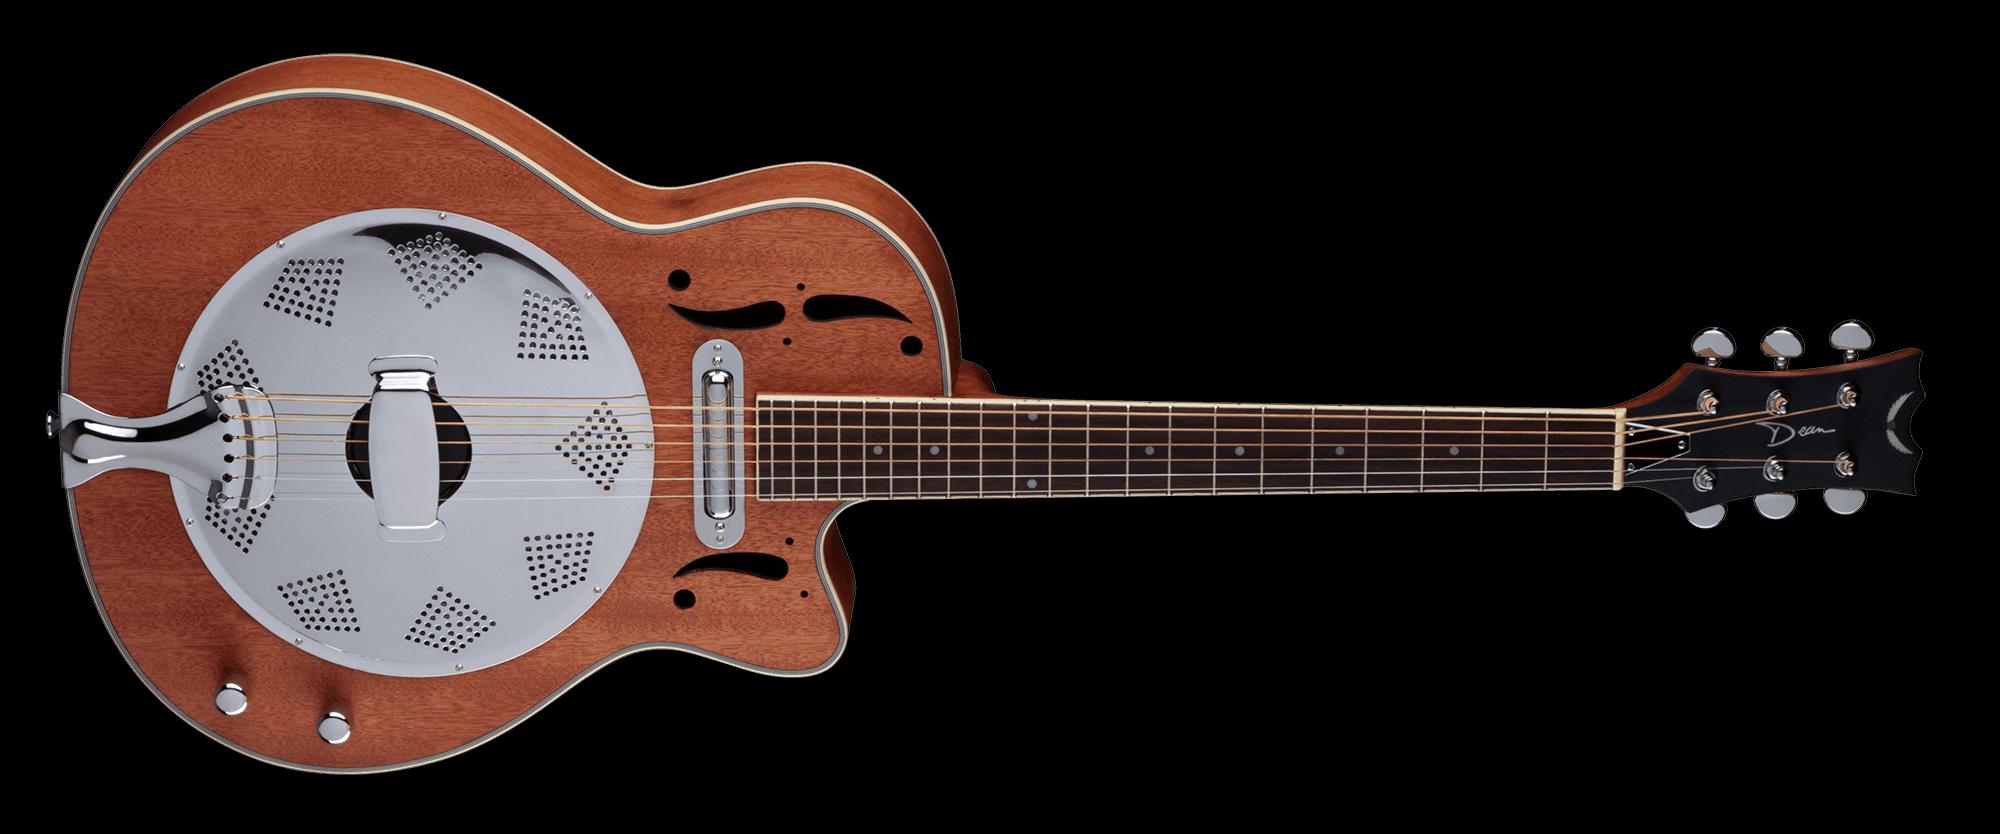 Dean RCE NM Acoustic-Electric Resonator Guitar - Open Box